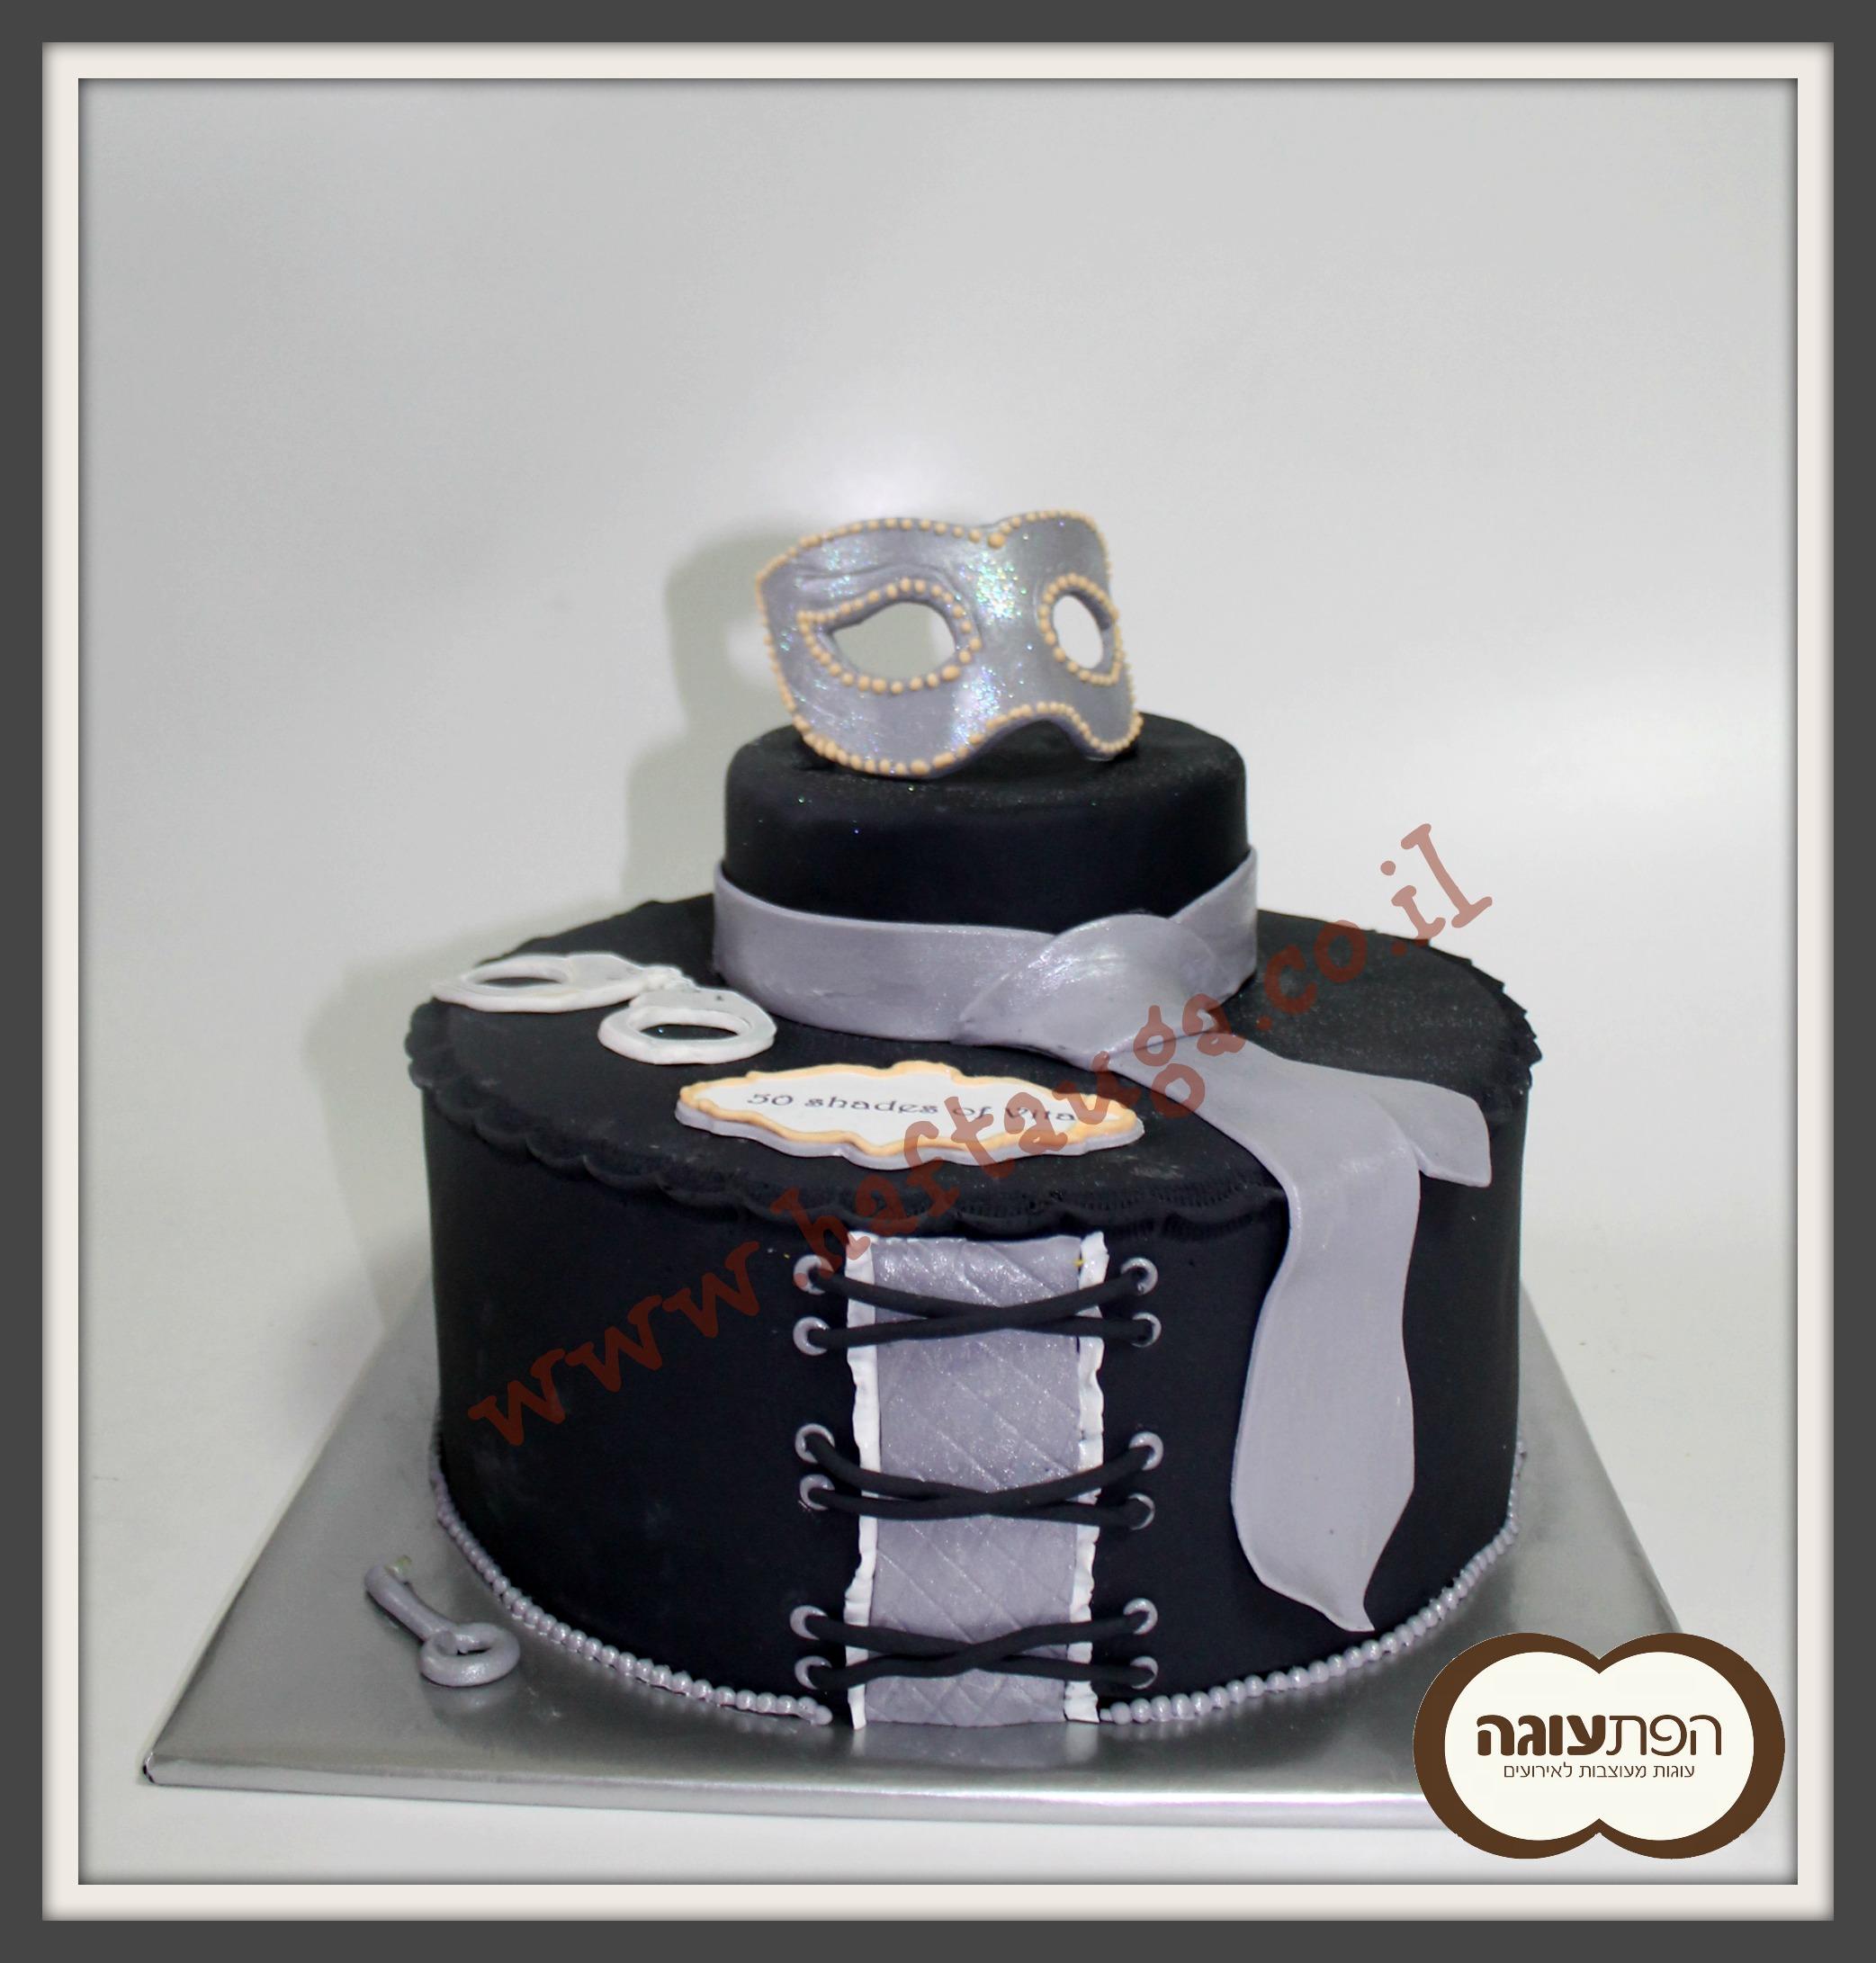 50 shades of gray cake